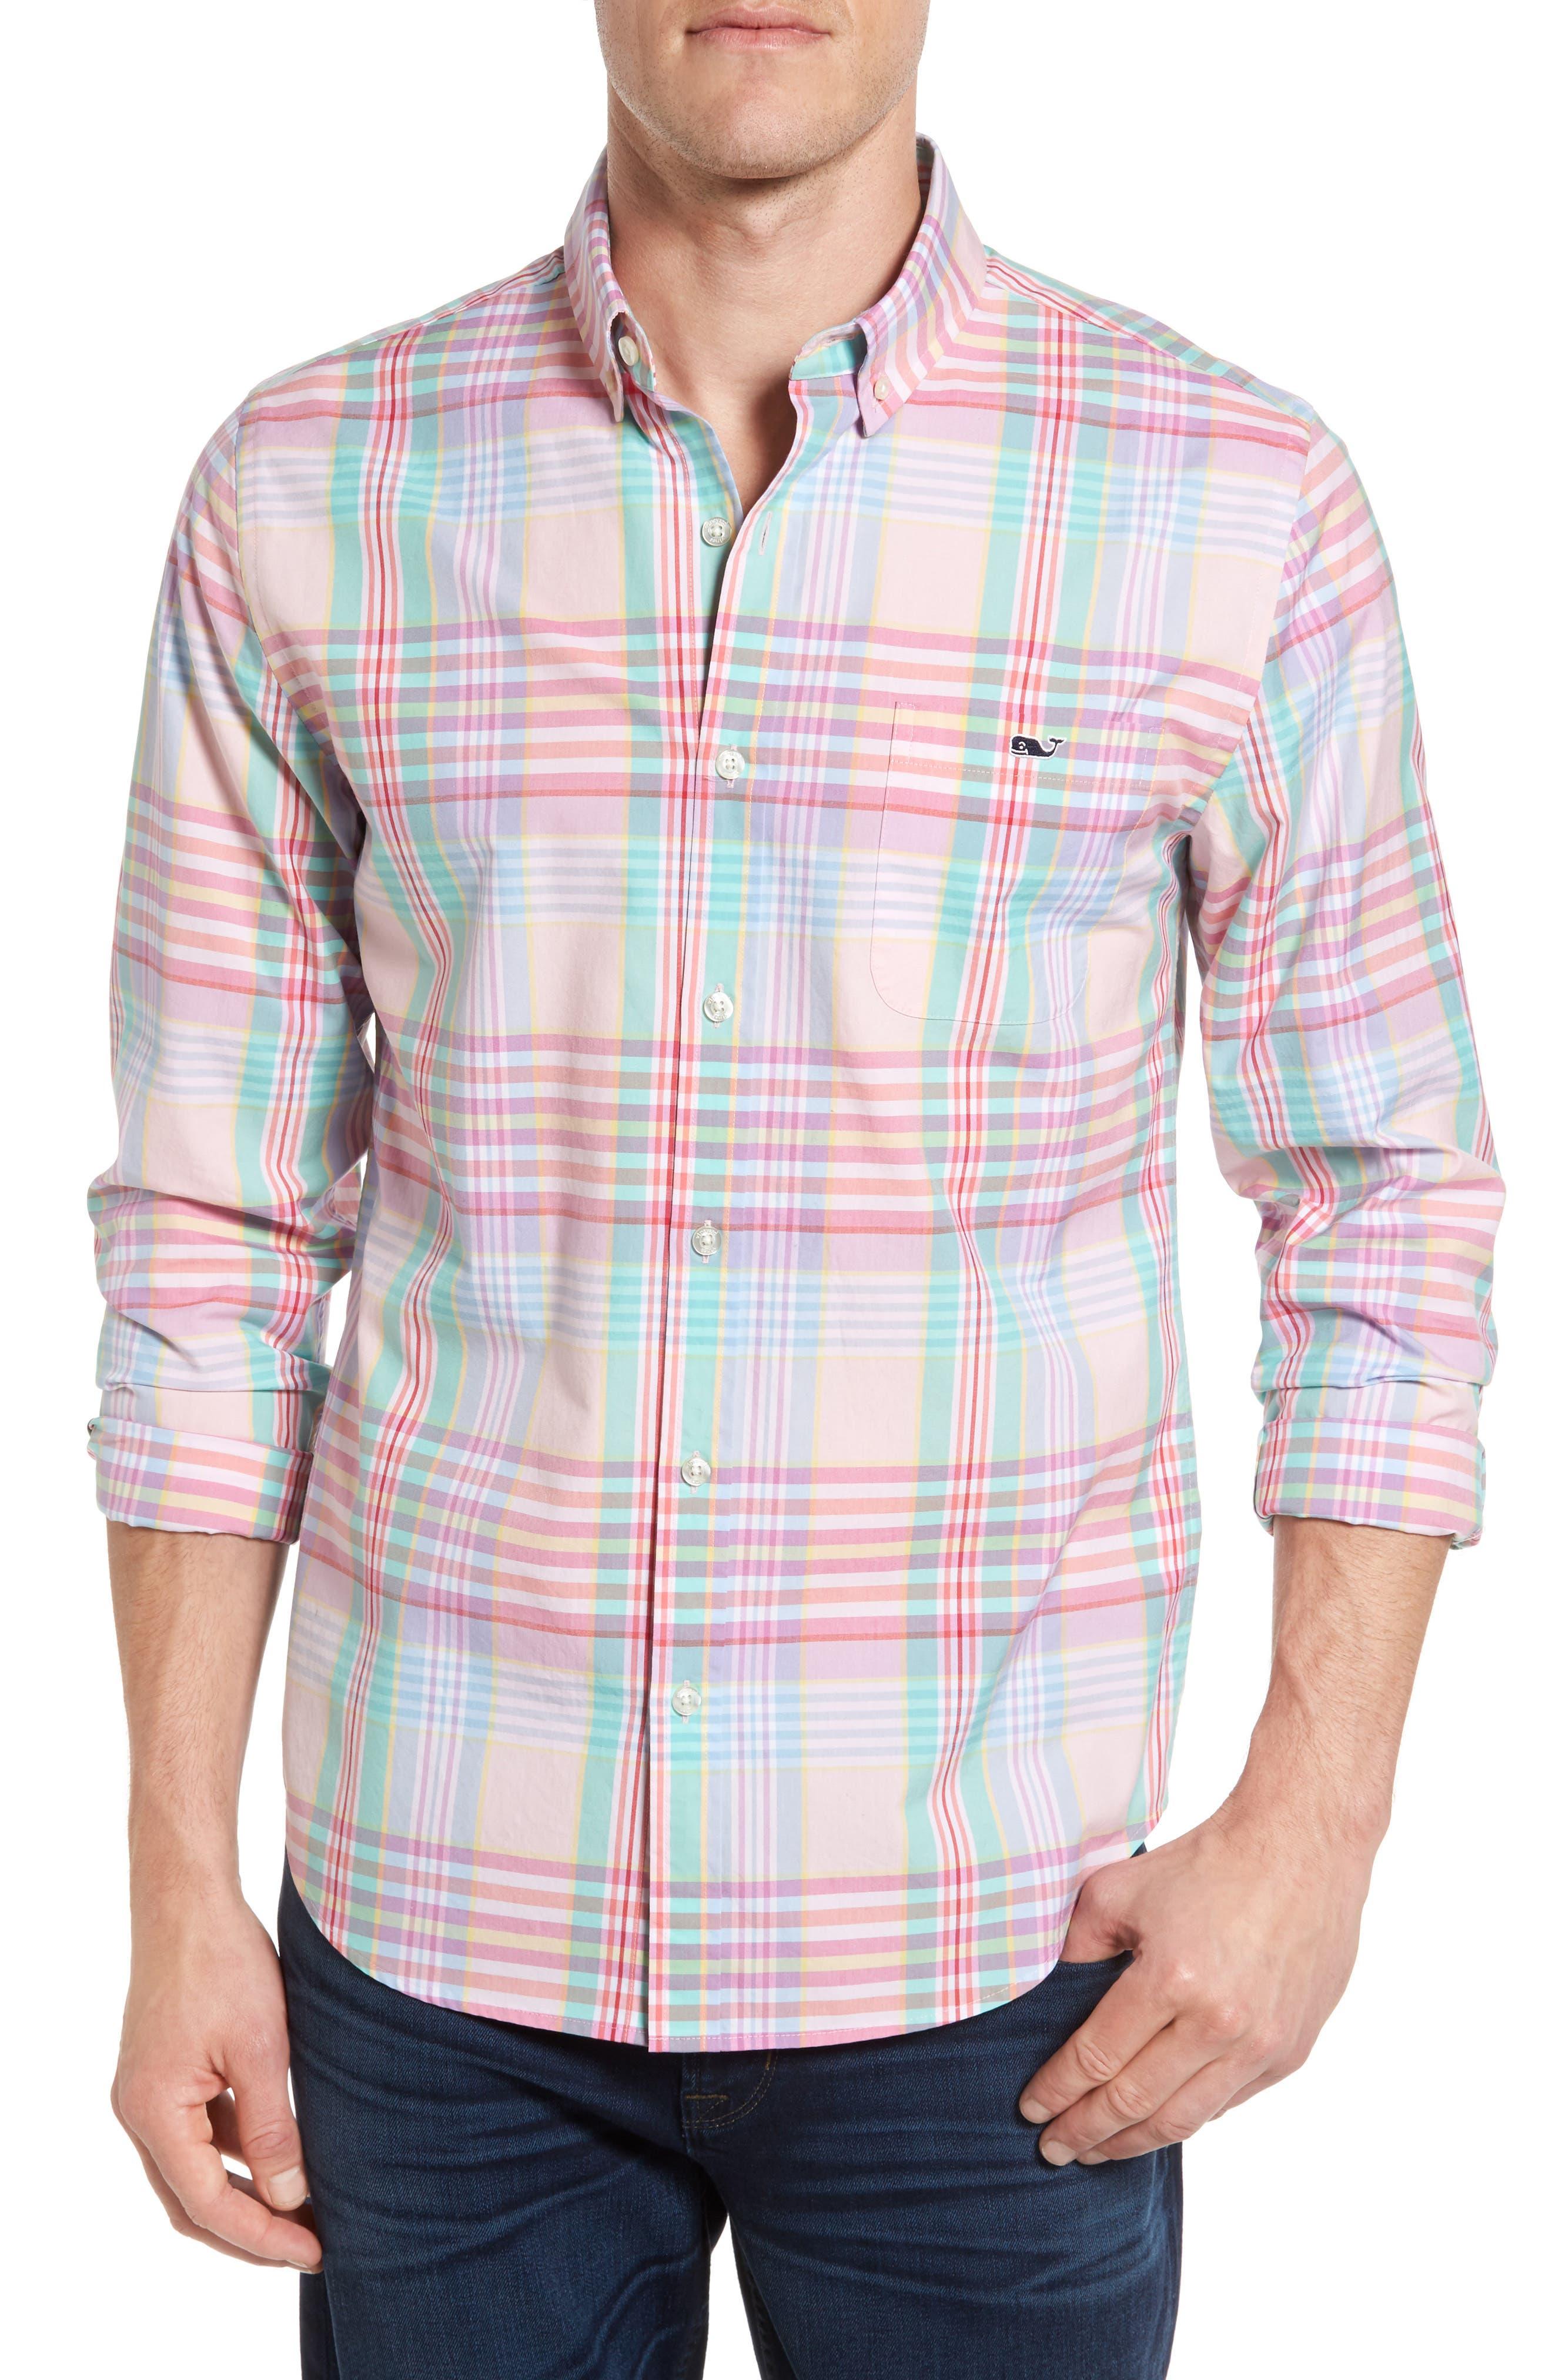 Alternate Image 1 Selected - Vineyard Vines Slim Fit Tucker Plaid Sport Shirt